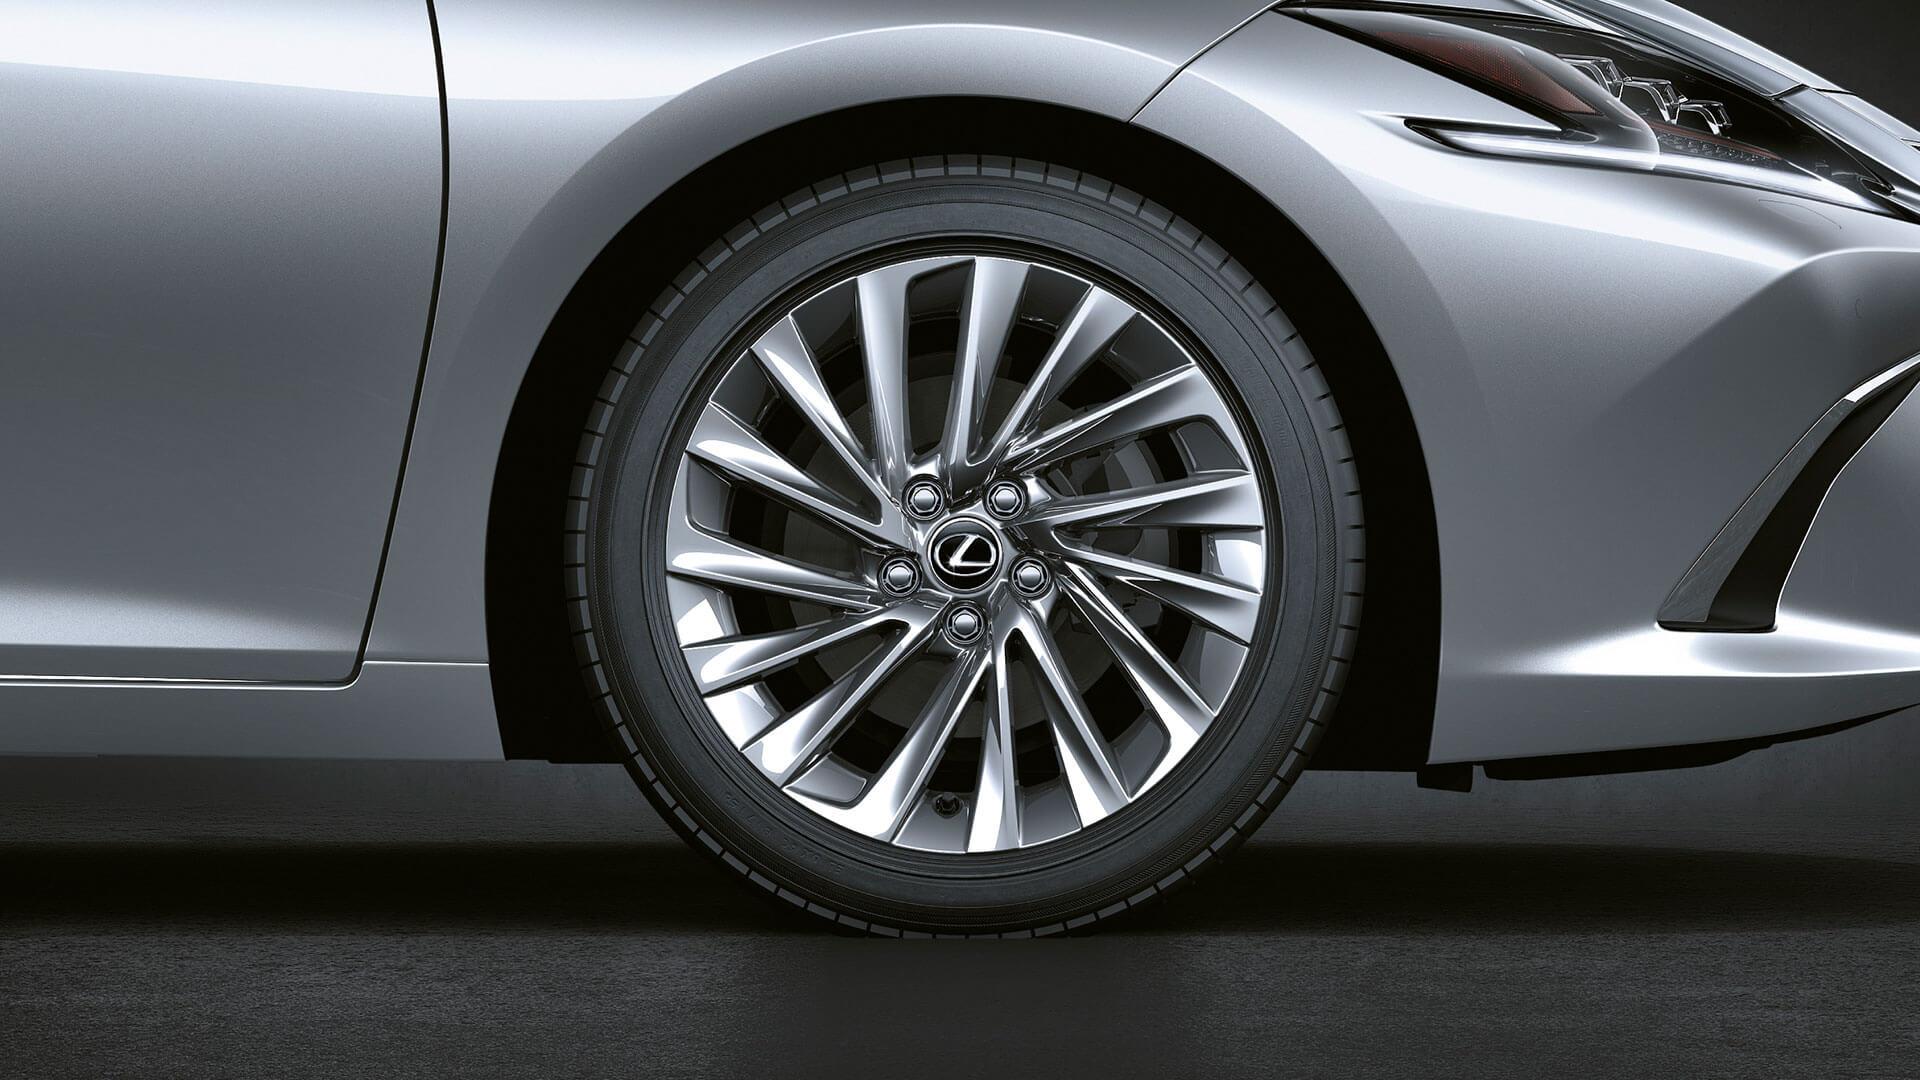 2019 lexus es 250 experience feature noise reducing wheels